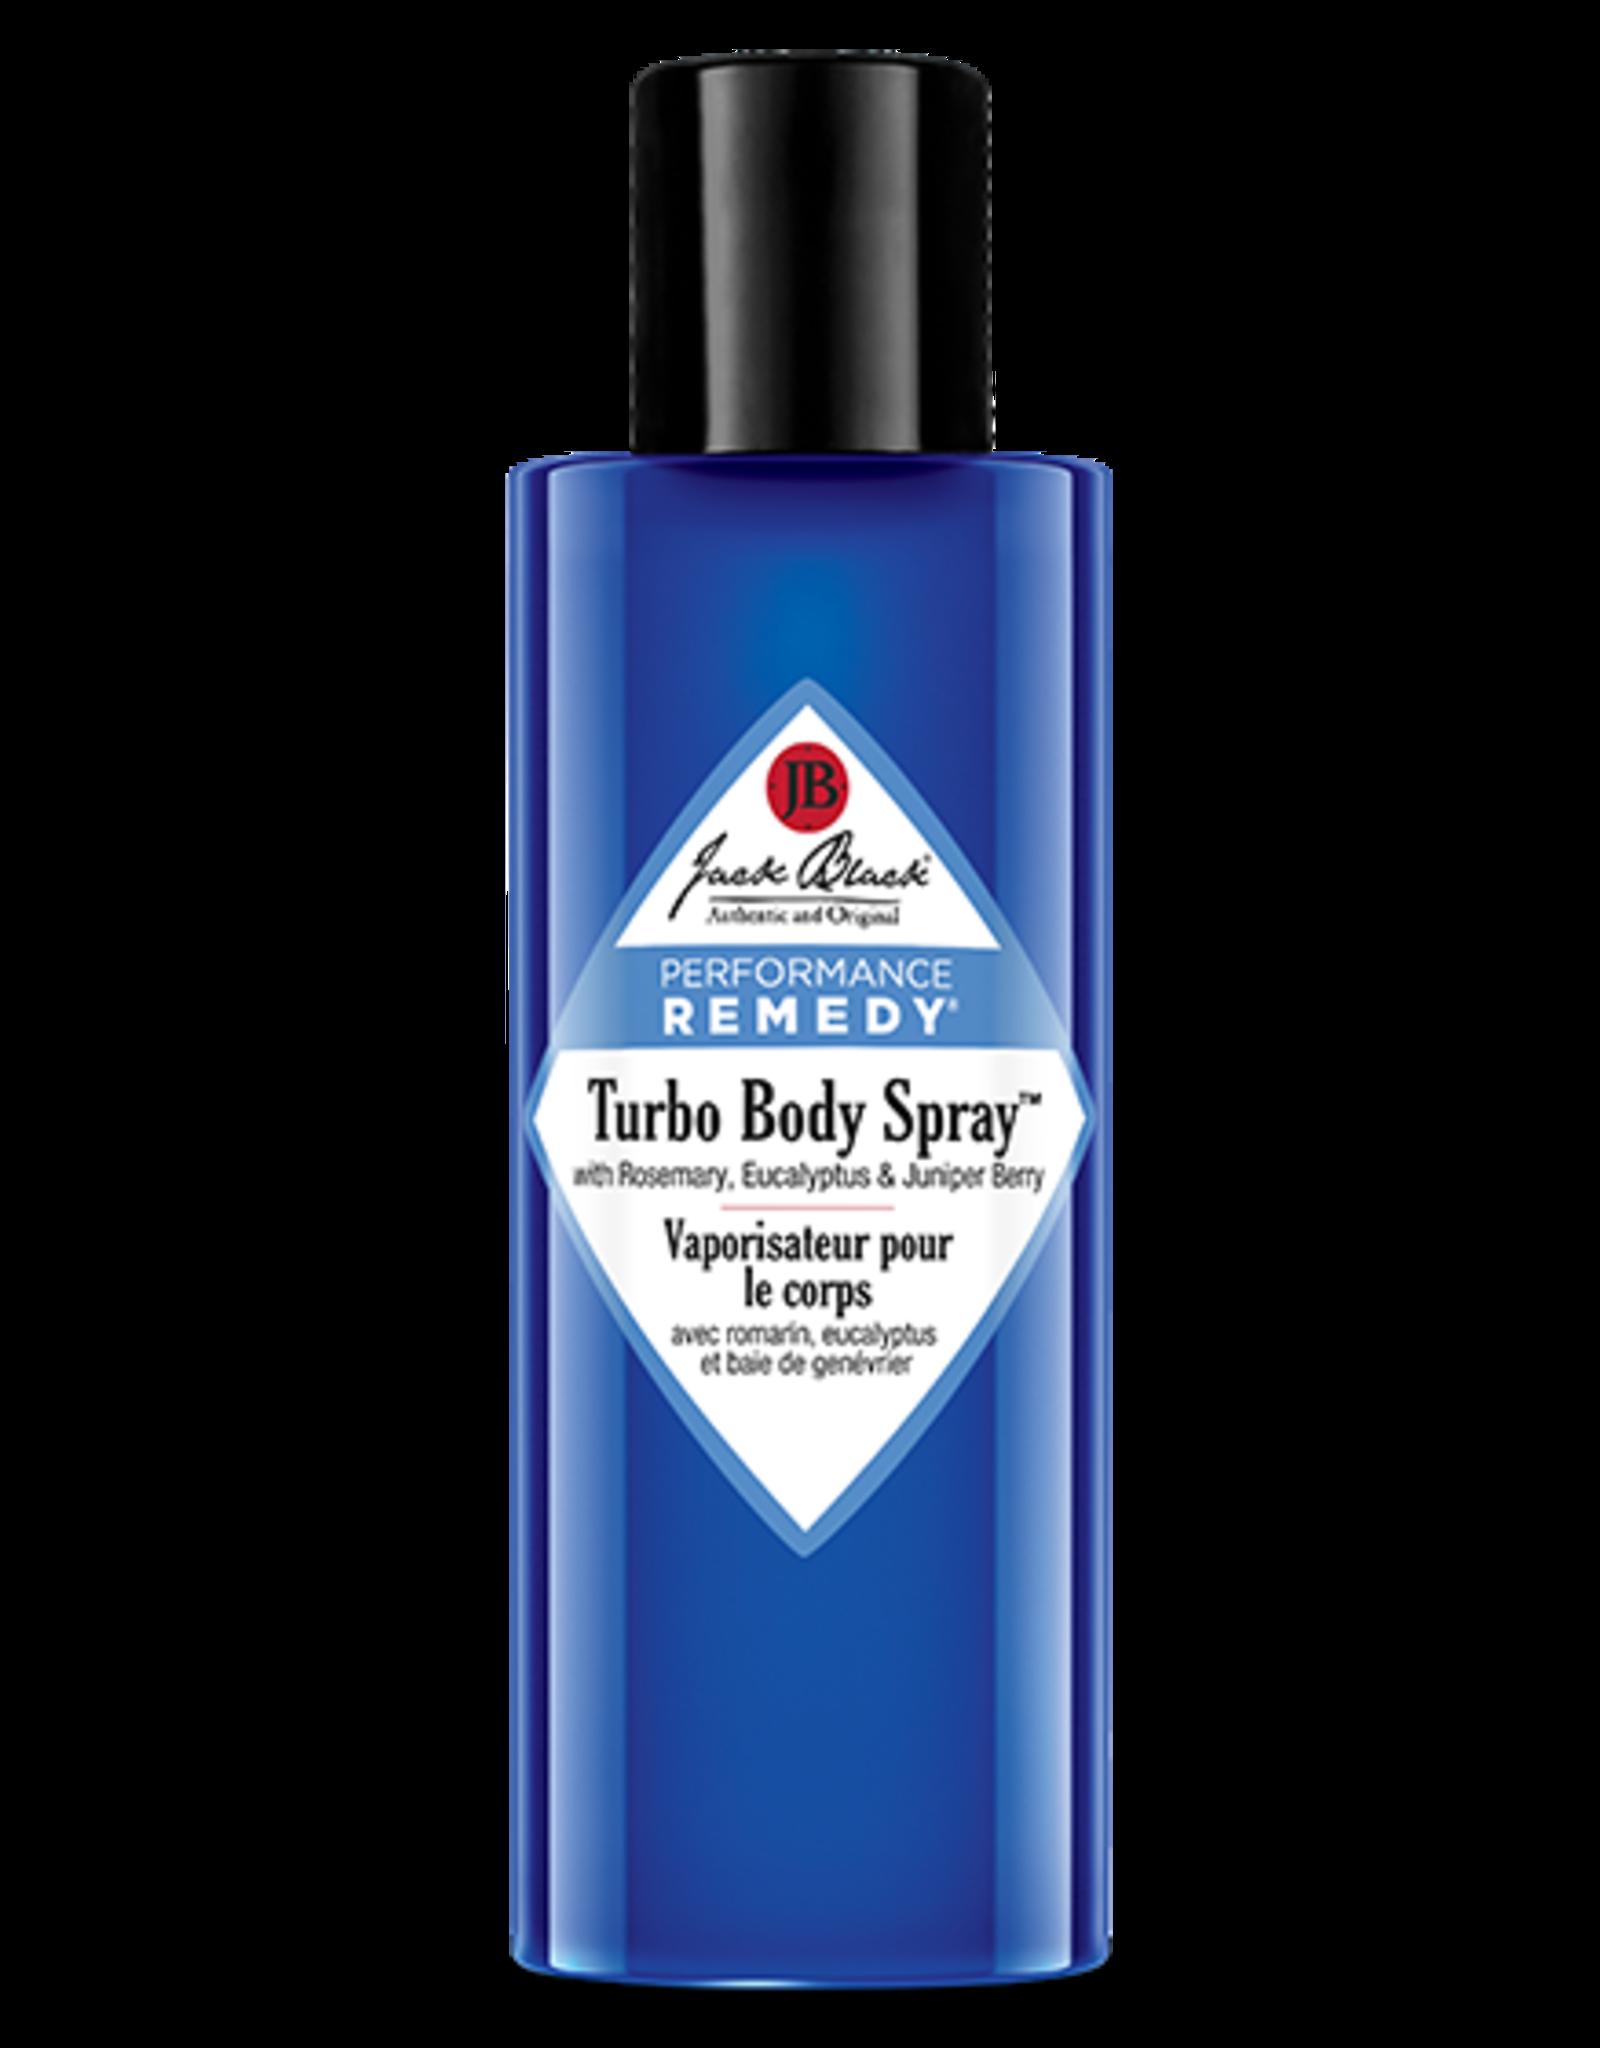 Jack Black Turbo Body Spray